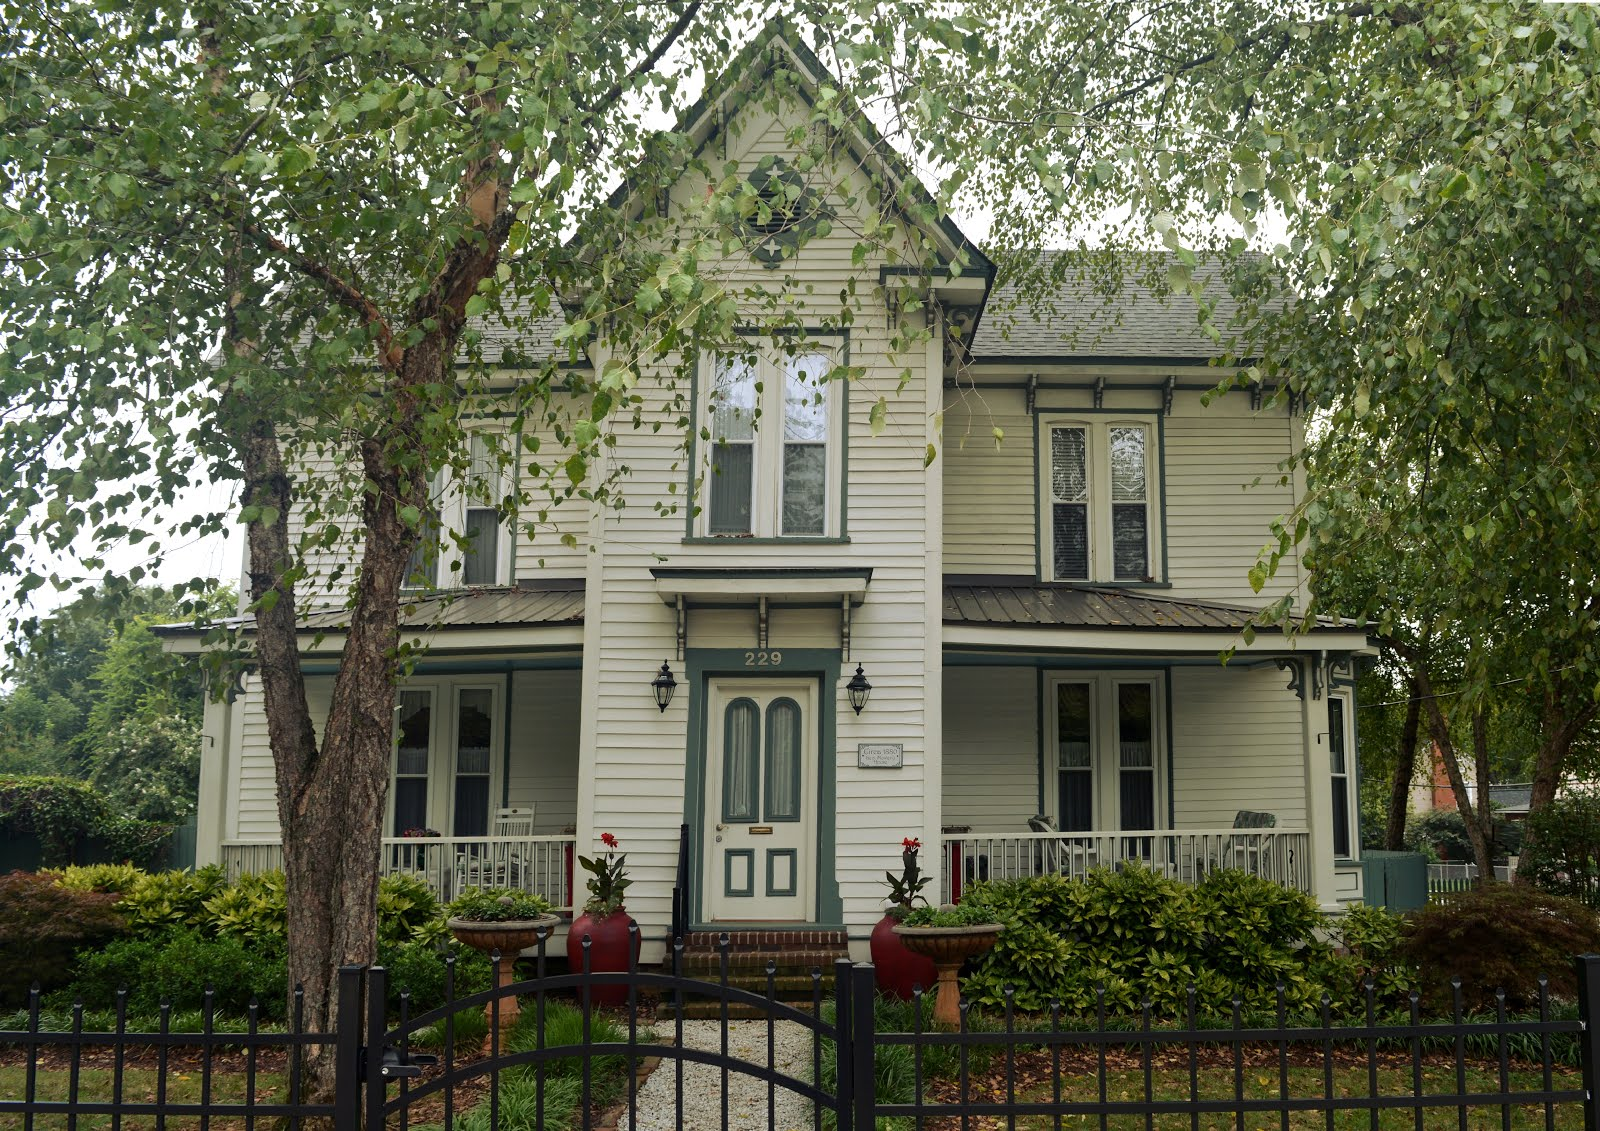 229 S. Long Street, Salisbury NC 28144 ~ Circa 1880 ~ $218,000